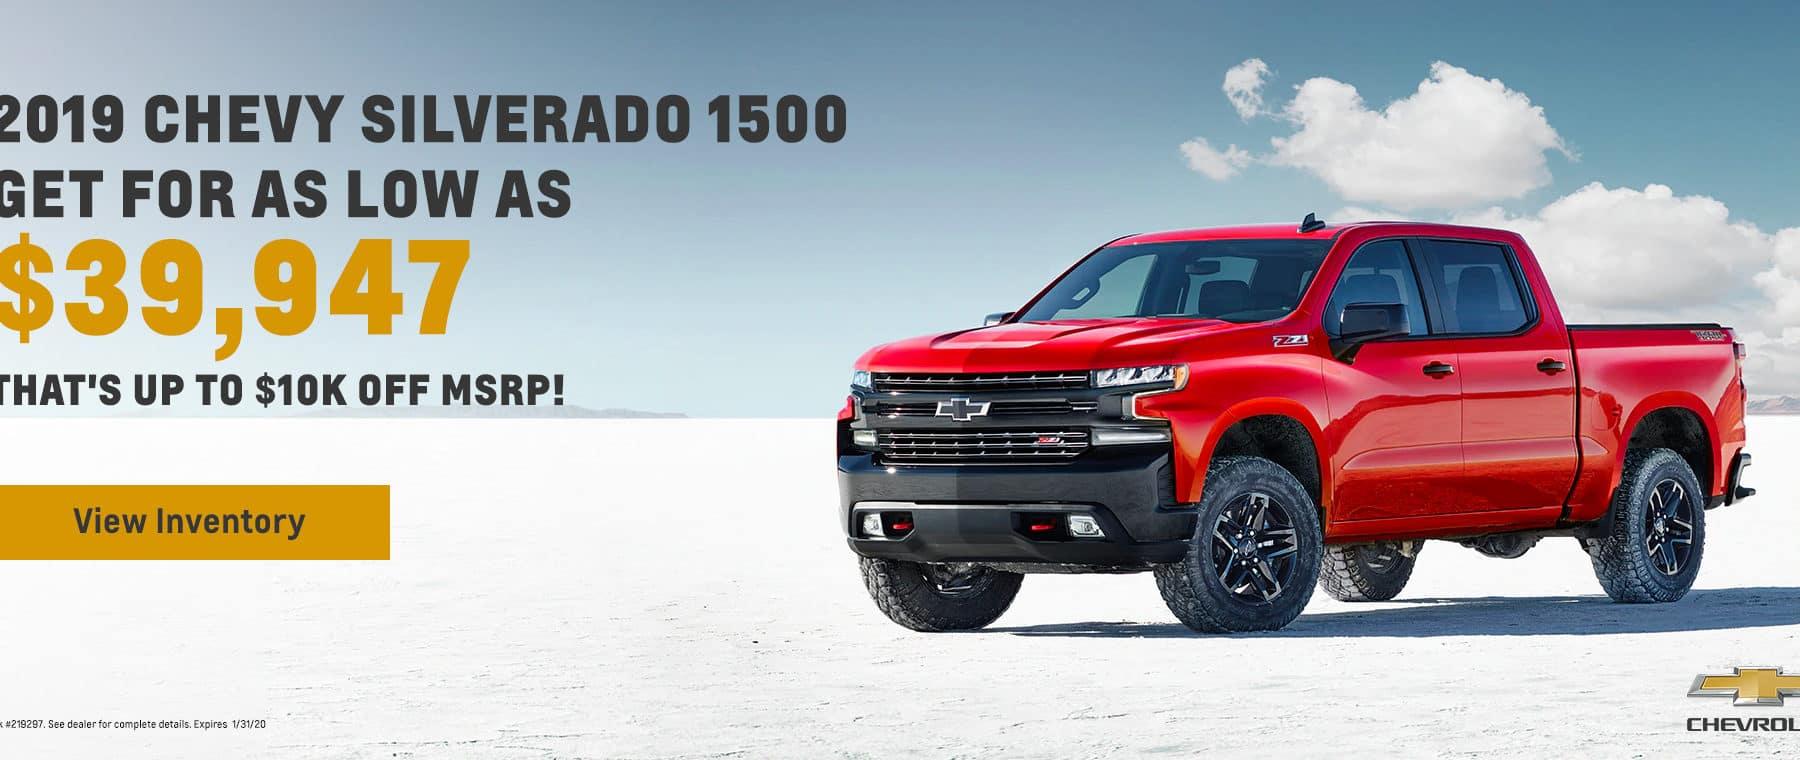 2019 Silverado 1500 offer!